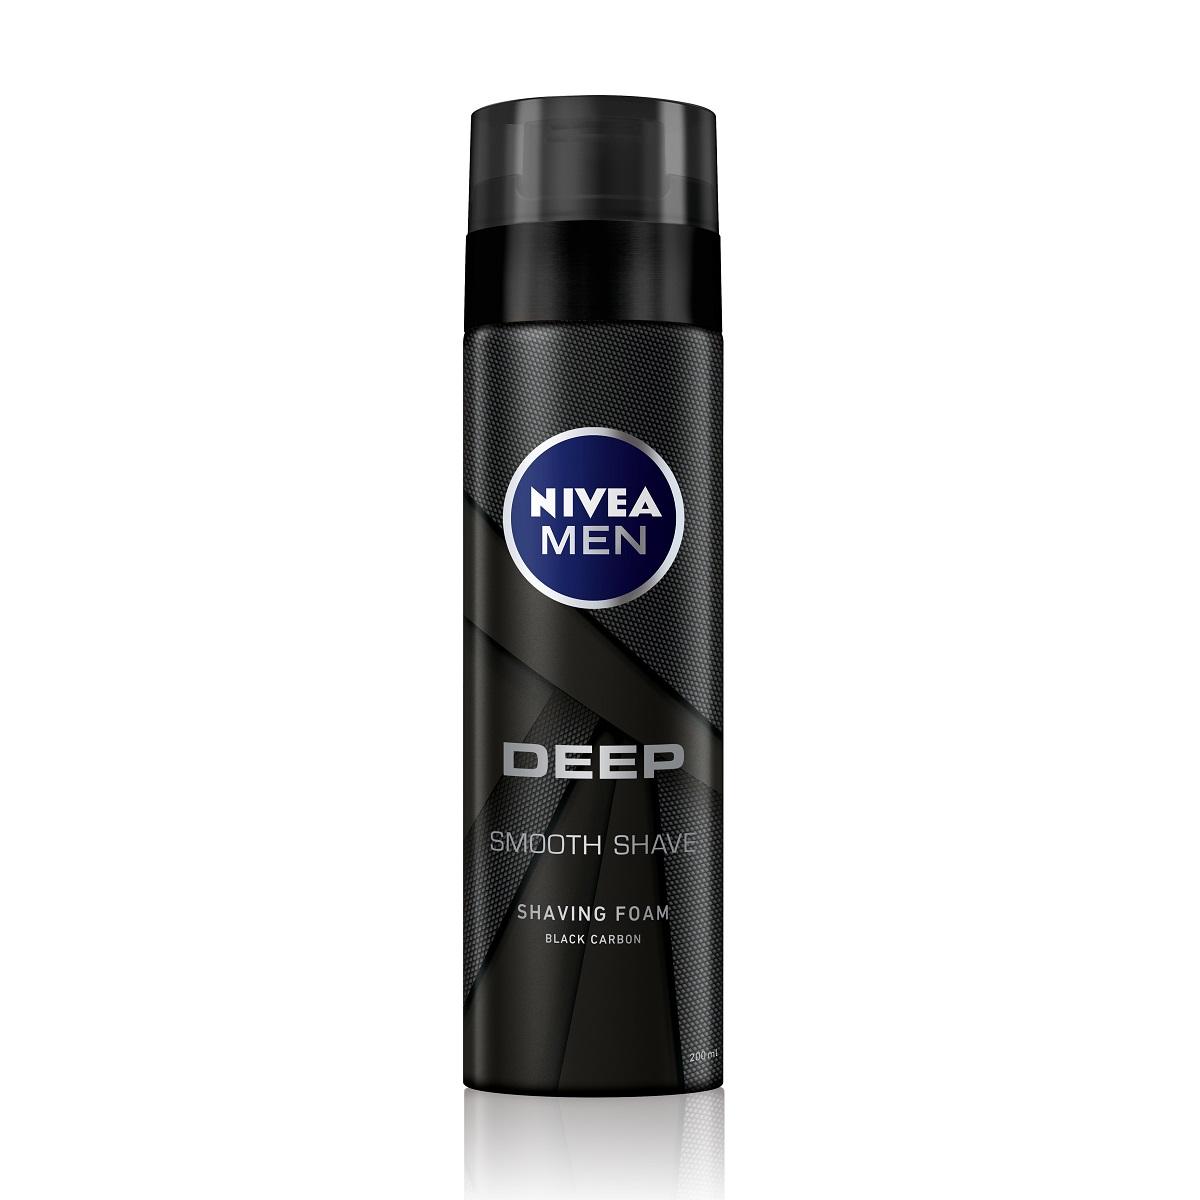 NIVEA妮維雅男士深極炭極淨保濕刮鬍泡200ml